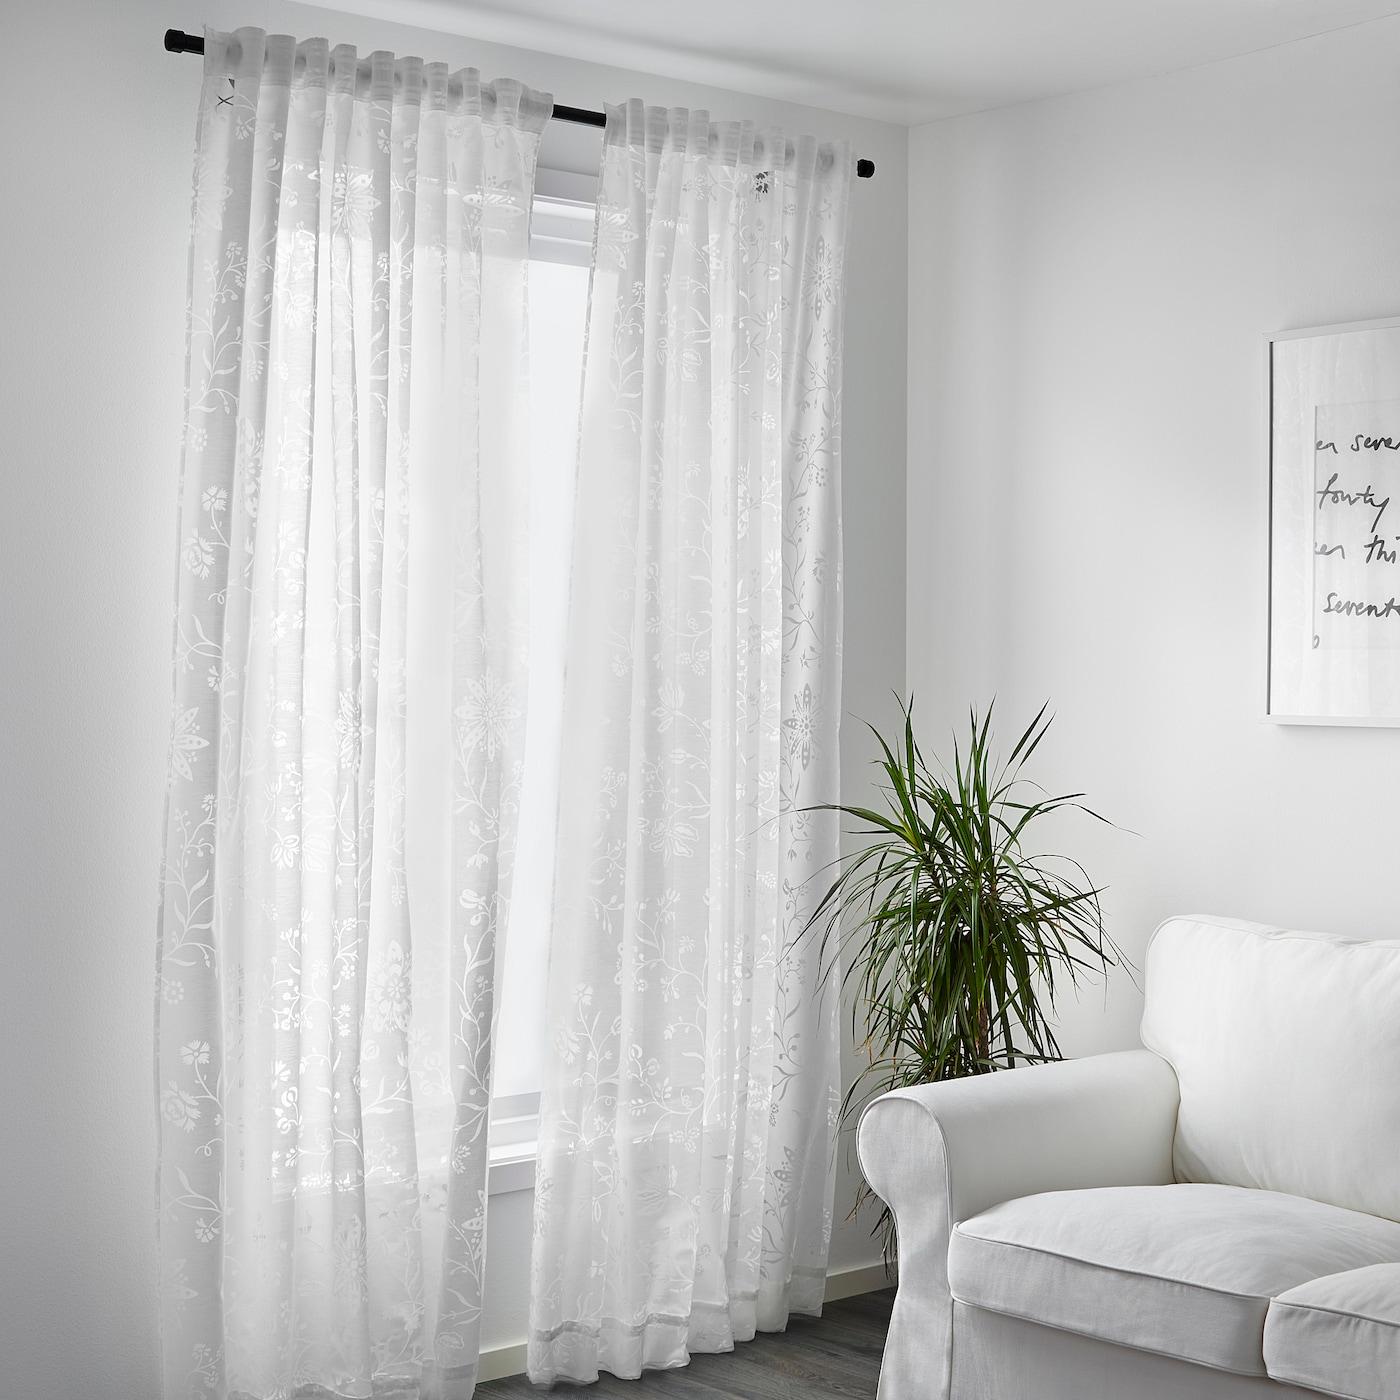 Borghild Sheer Curtains 1 Pair White 57x98 Ikea